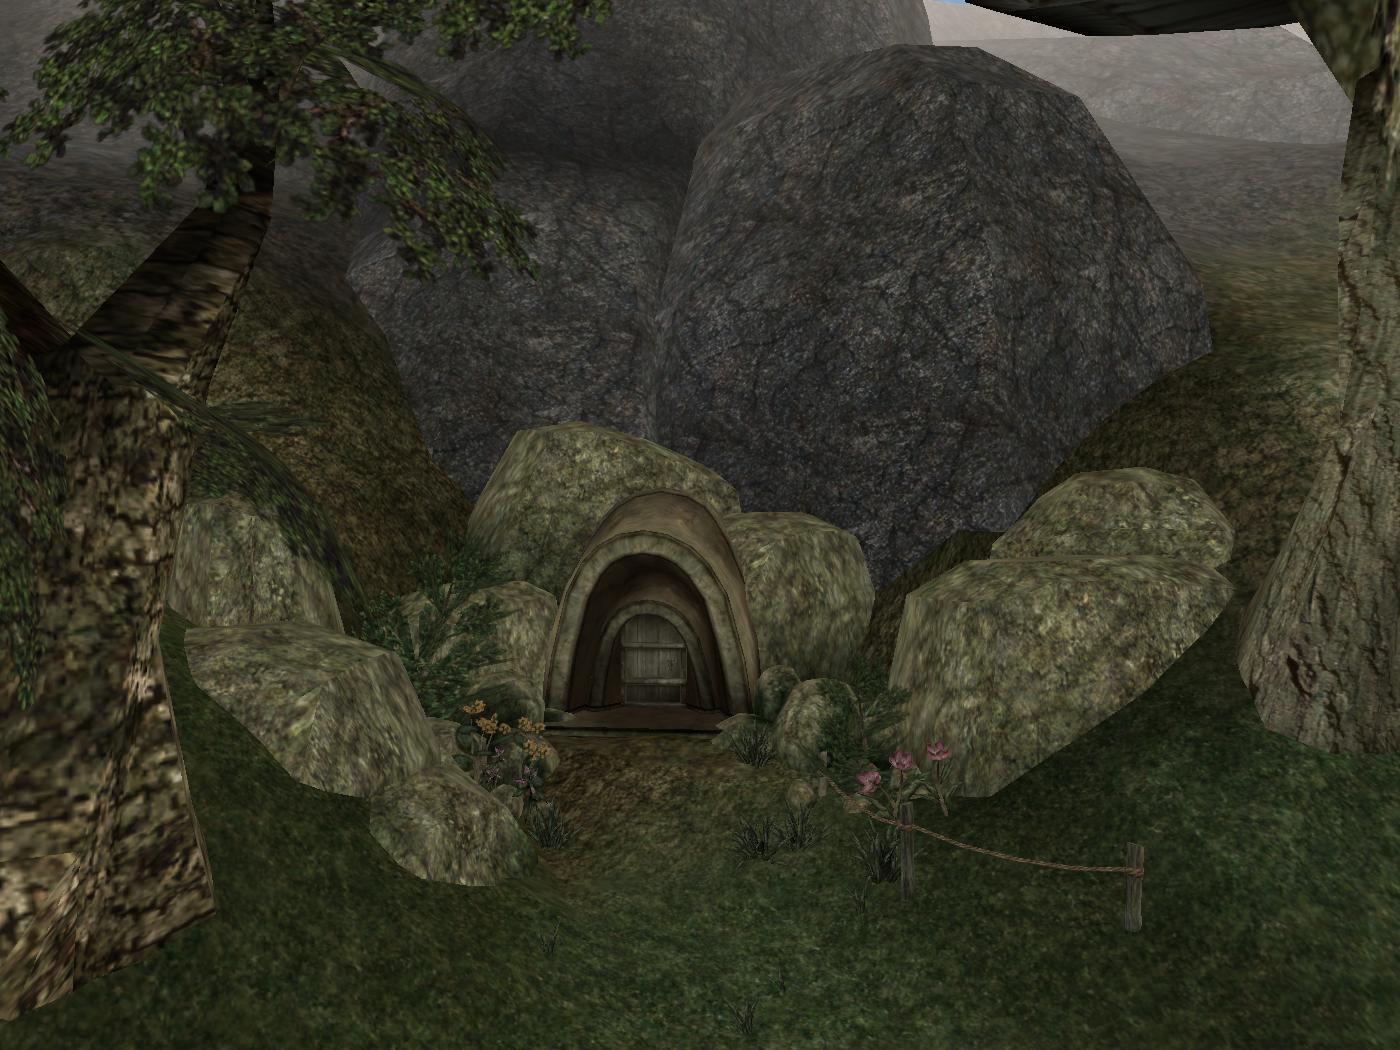 Lleran Ancestral Tomb (Morrowind)